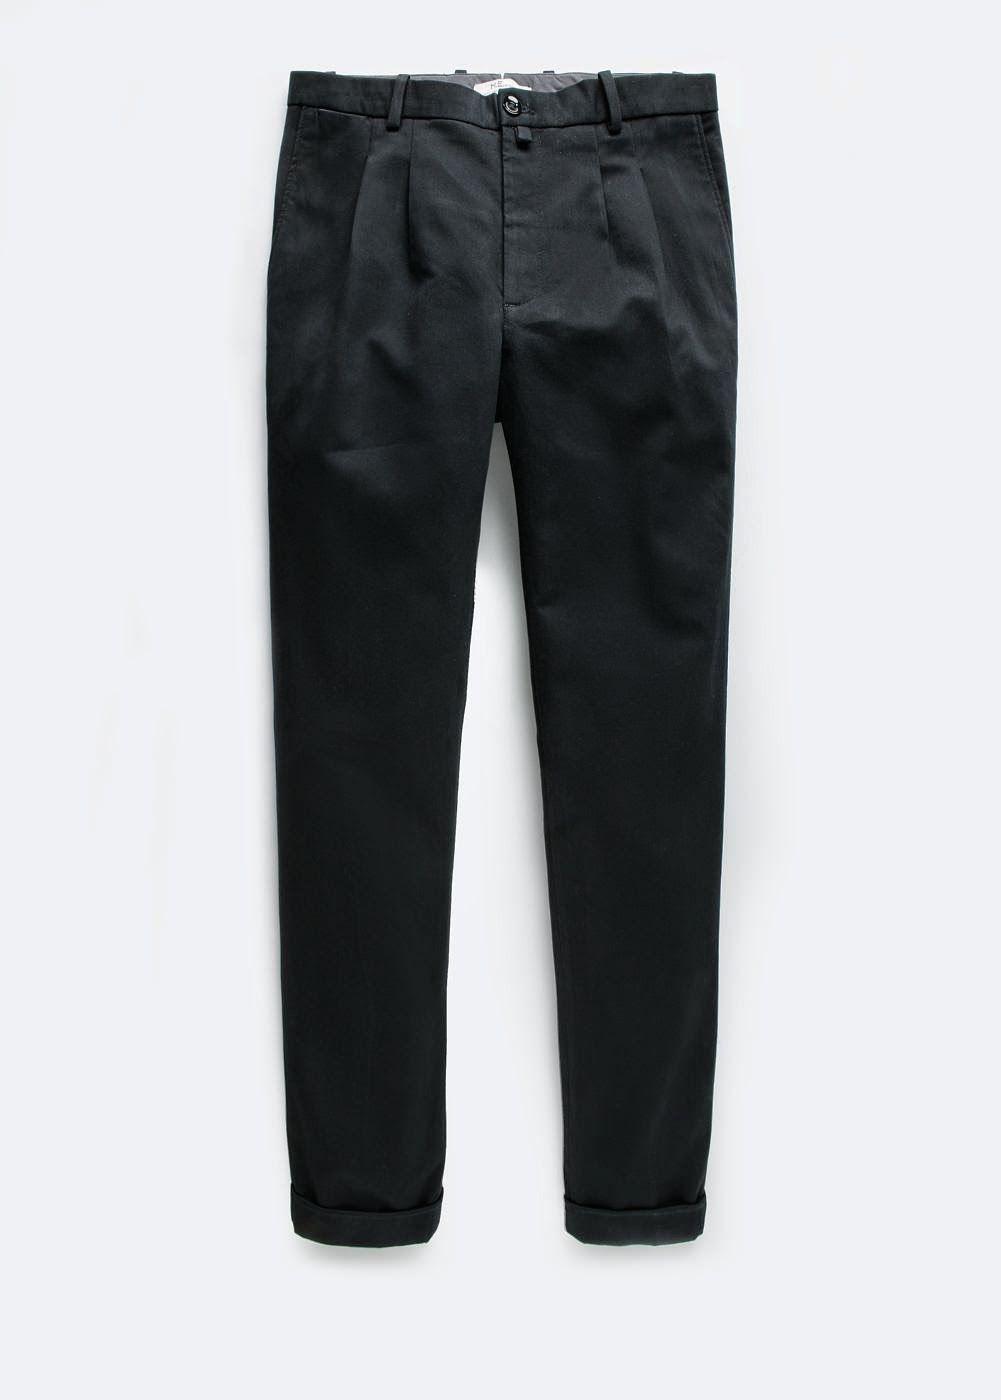 http://shop.mango.com/ES/p0/hombre/prendas/pantalones/chino-cropped-pinzas/?id=31033018_02&n=1&s=prendas_he.pantalones_he&ident=0_color9_0_1417510401270&ts=1417510401270